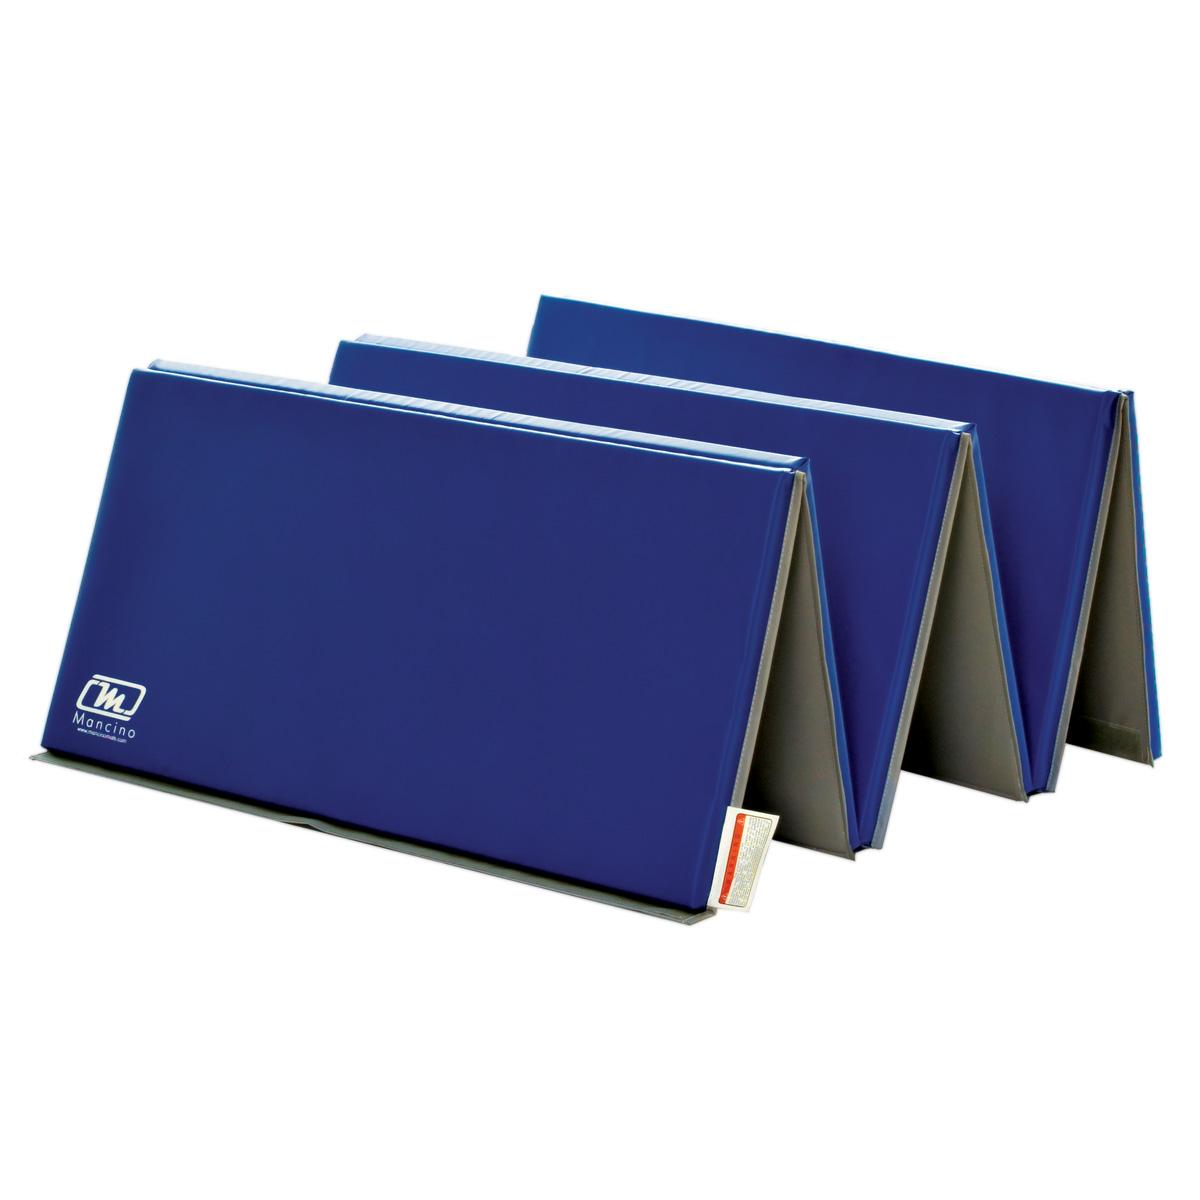 "1-3/8"" cross-linked royal blue folding panel mat"